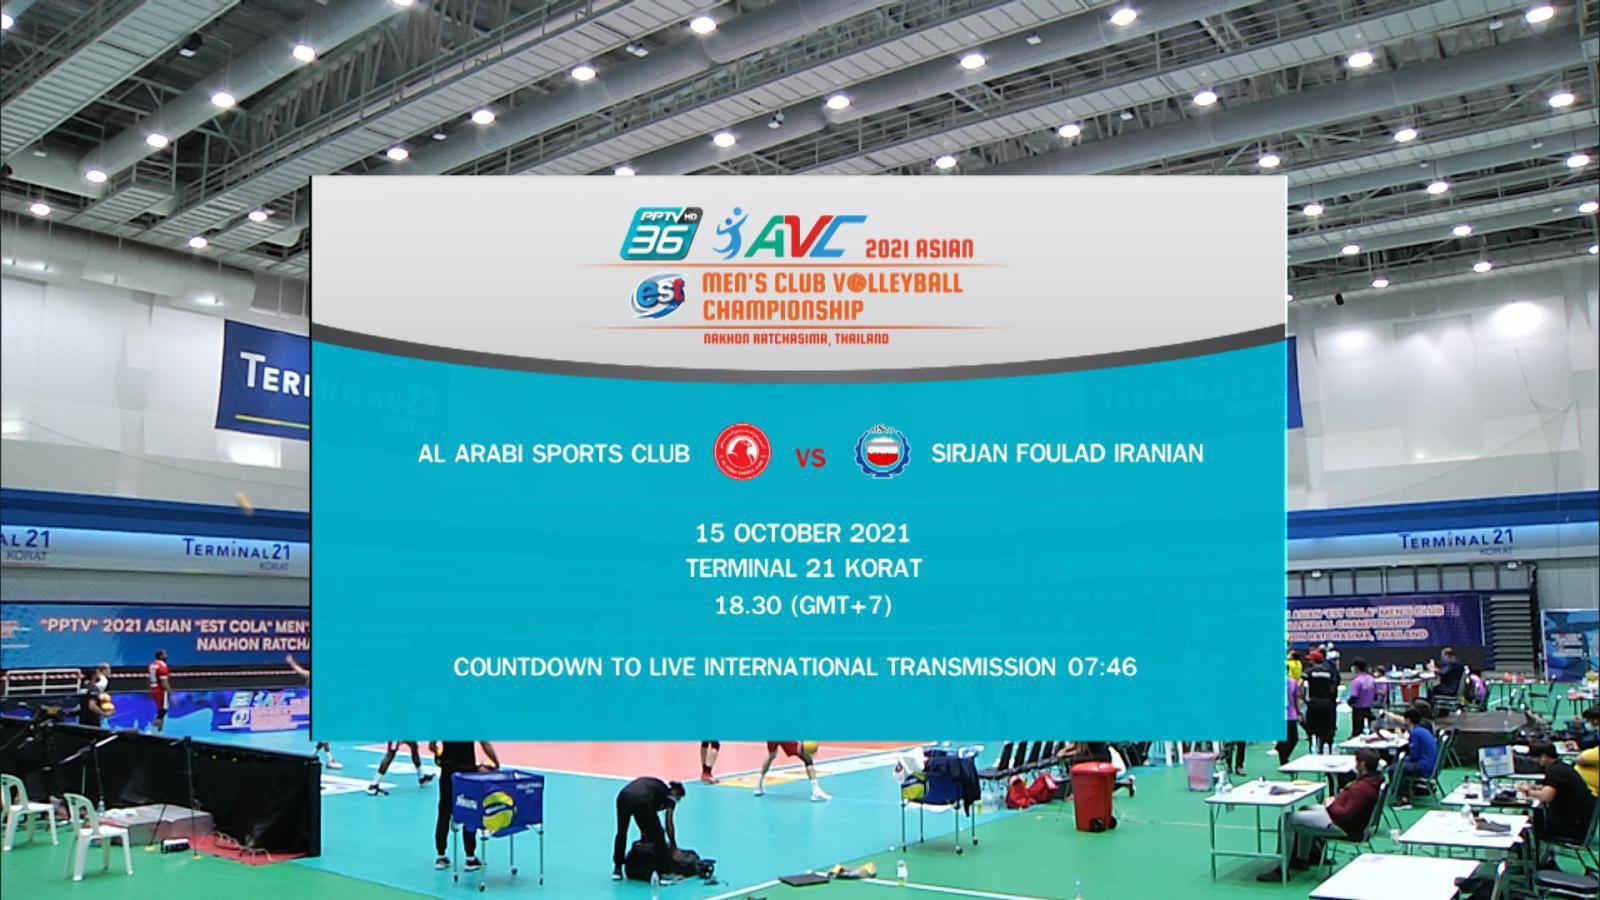 Full Match | พีพีทีวี วอลเลย์บอลสโมสรชาย เอสโคล่า ชิงชนะเลิศแห่งเอเชีย | อัล-อาราบี สปอร์ตส์ คลับ 1-3 ซีร์จาน ฟูลาด | 15 ต.ค. 64